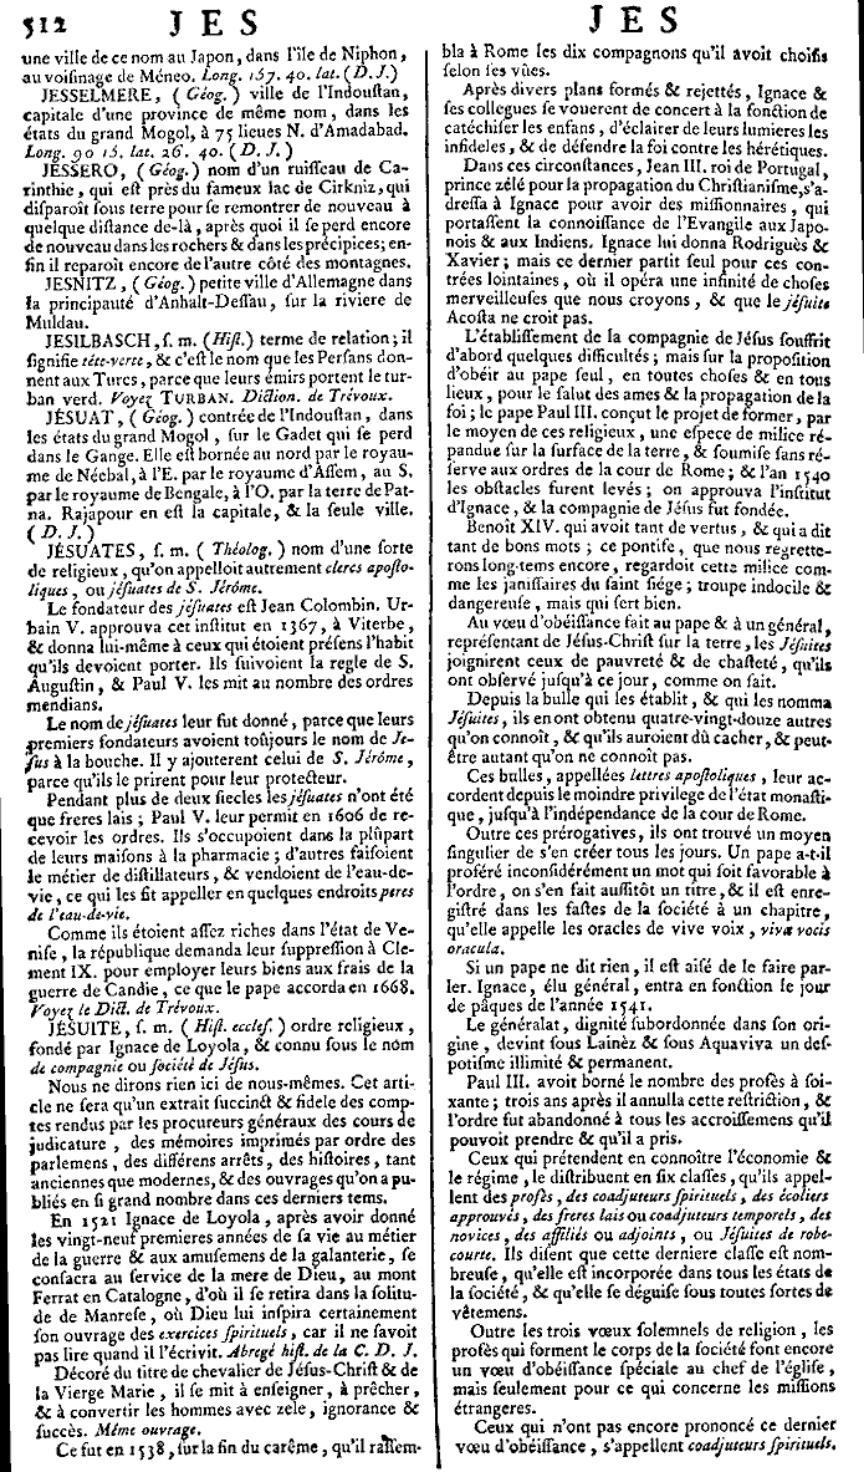 encyclopedie chevalier de jaucourt